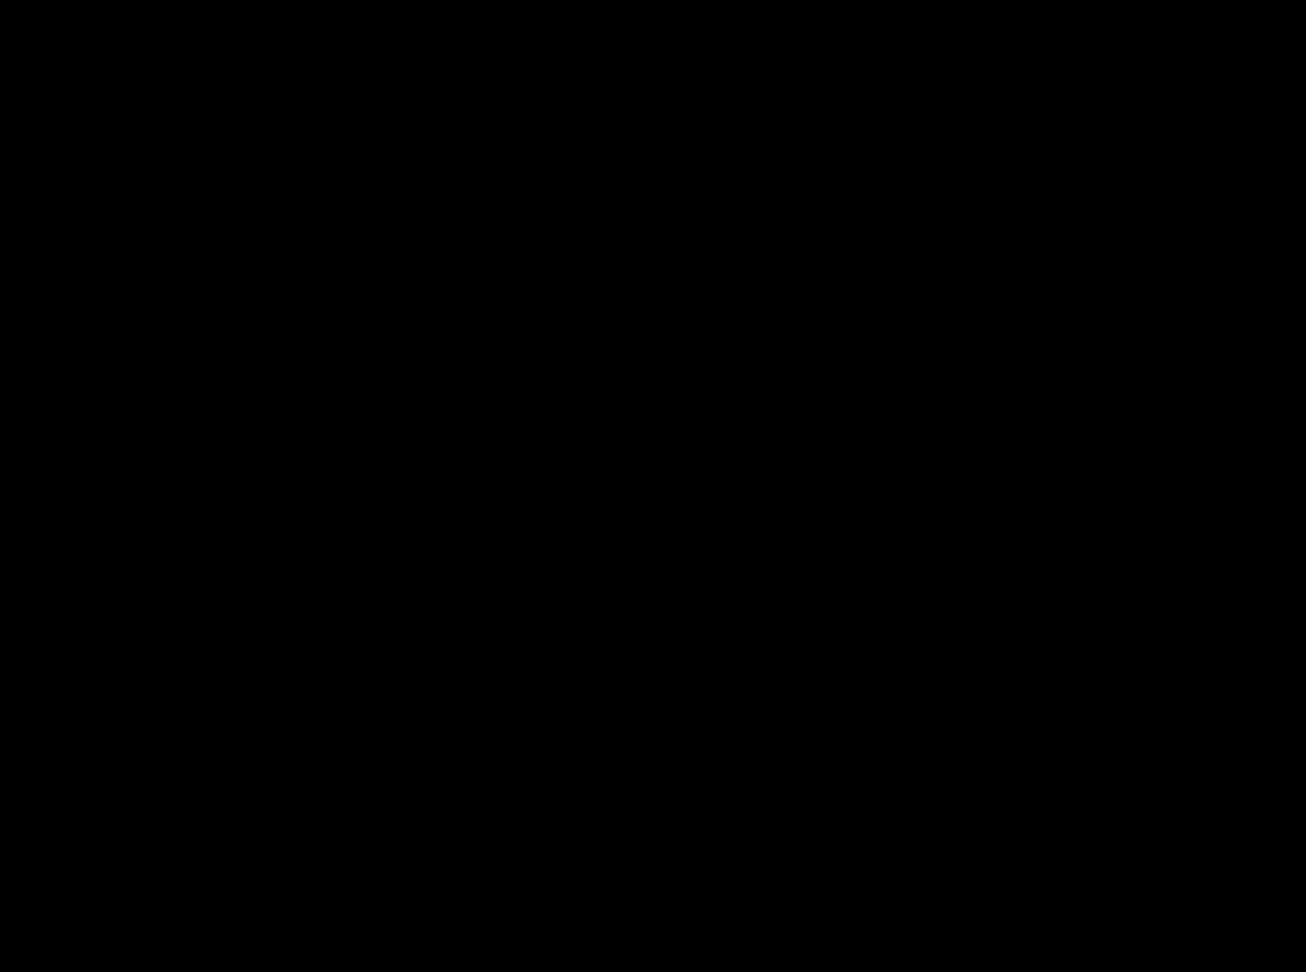 Manganese 54 Gamma Spectrum